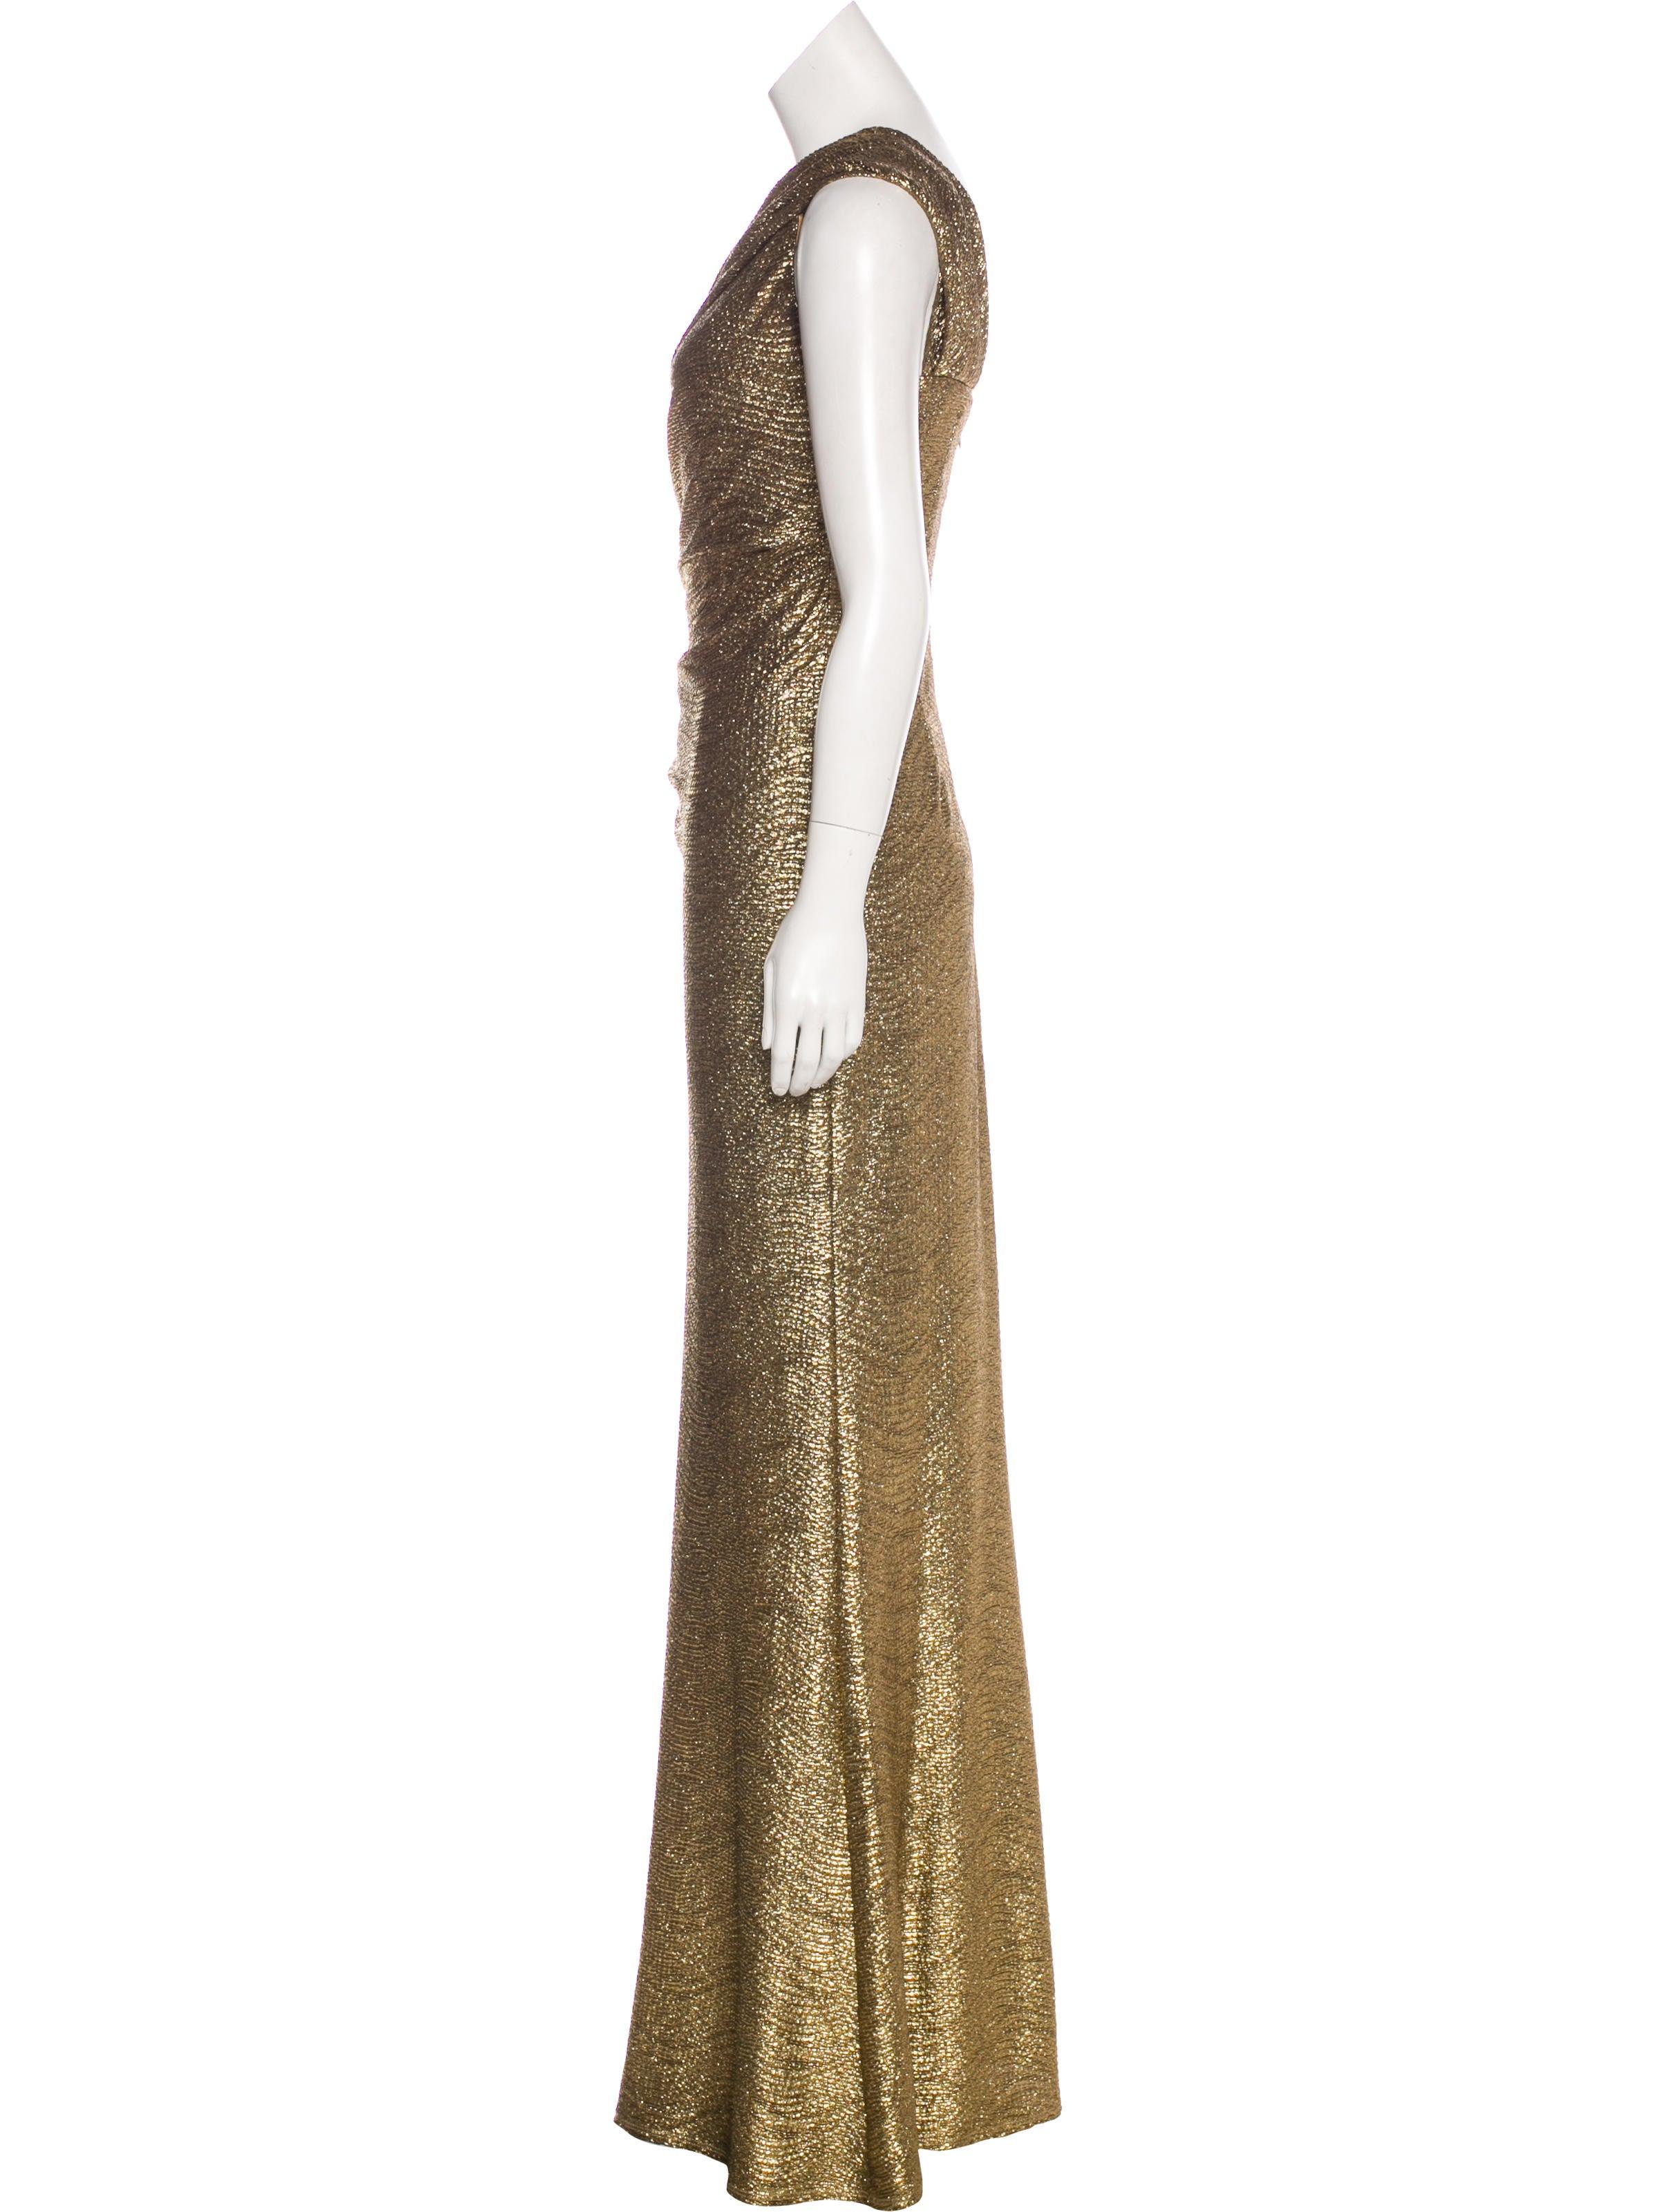 David Meister Metallic Maxi Dress - Clothing - WDM26330 | The RealReal